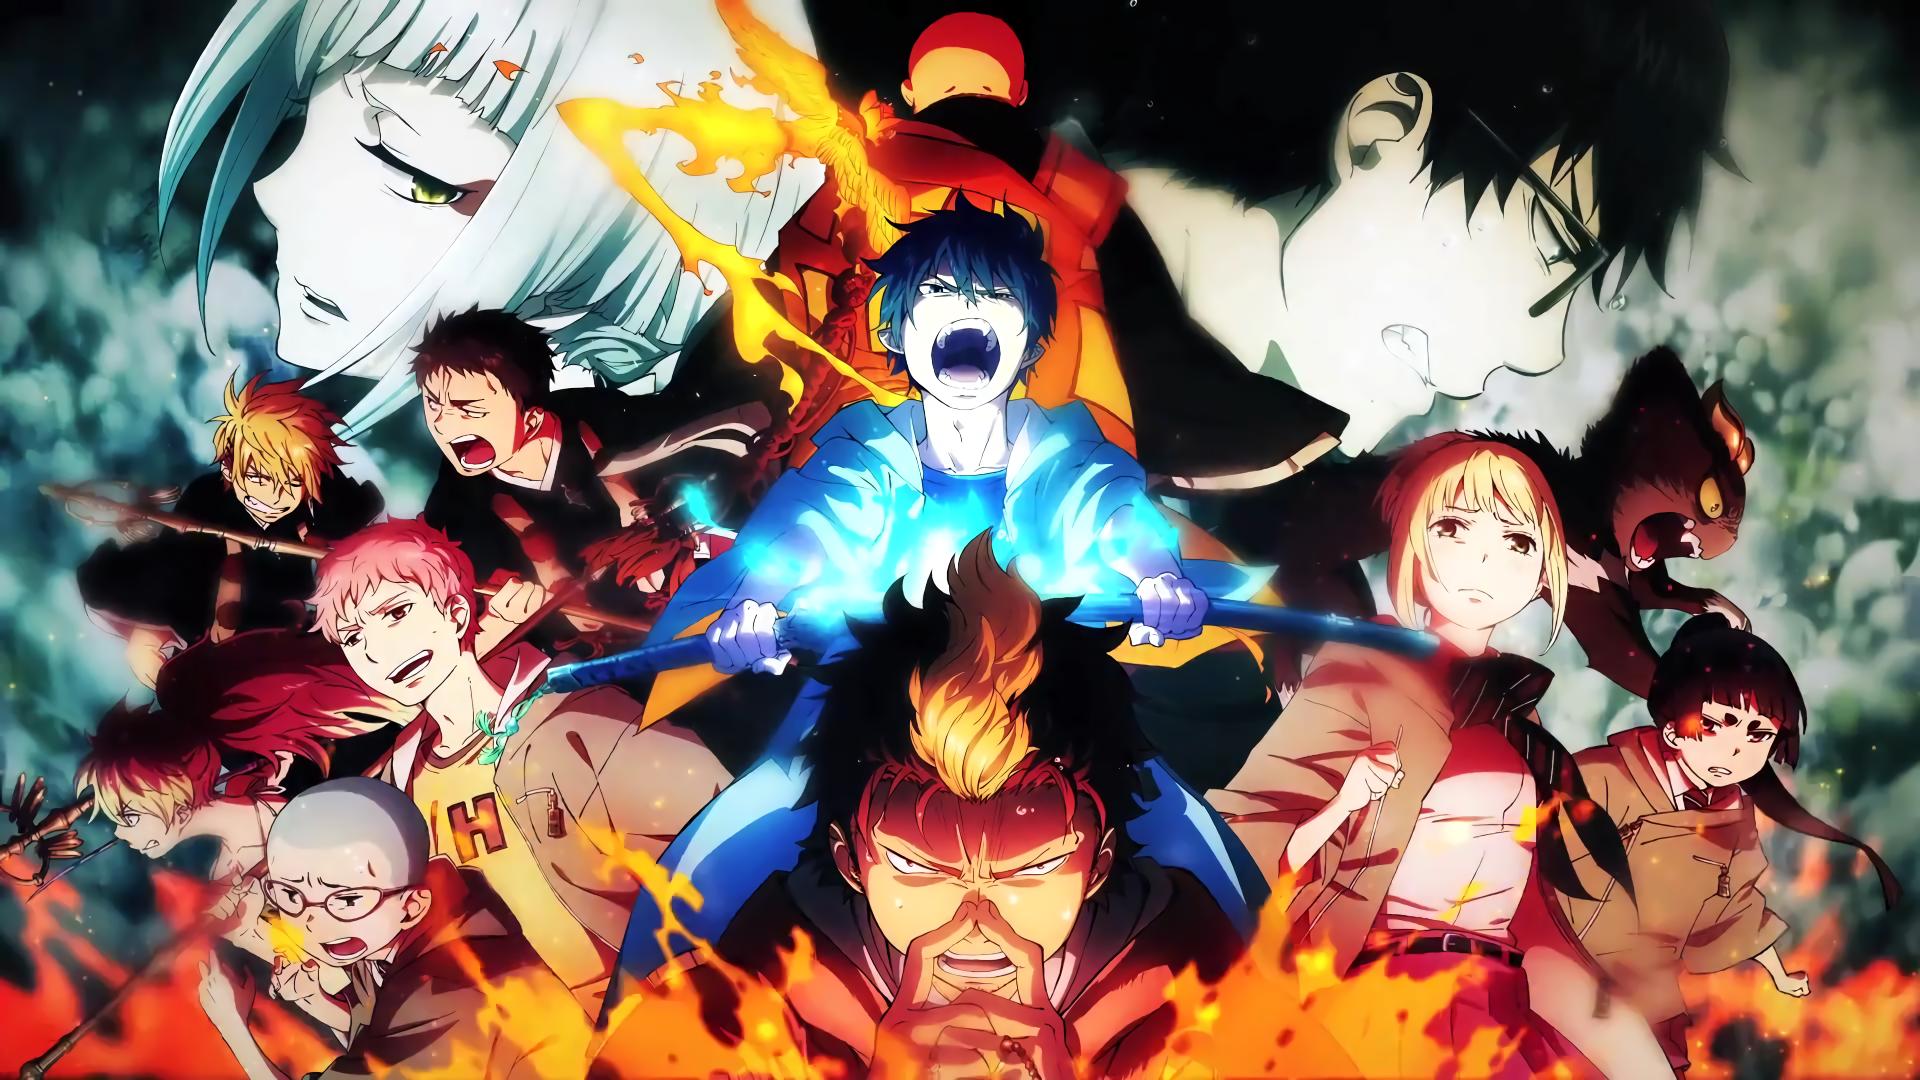 anime blue exorcist rin okumura yukio okumura shiemi moriyama kuro